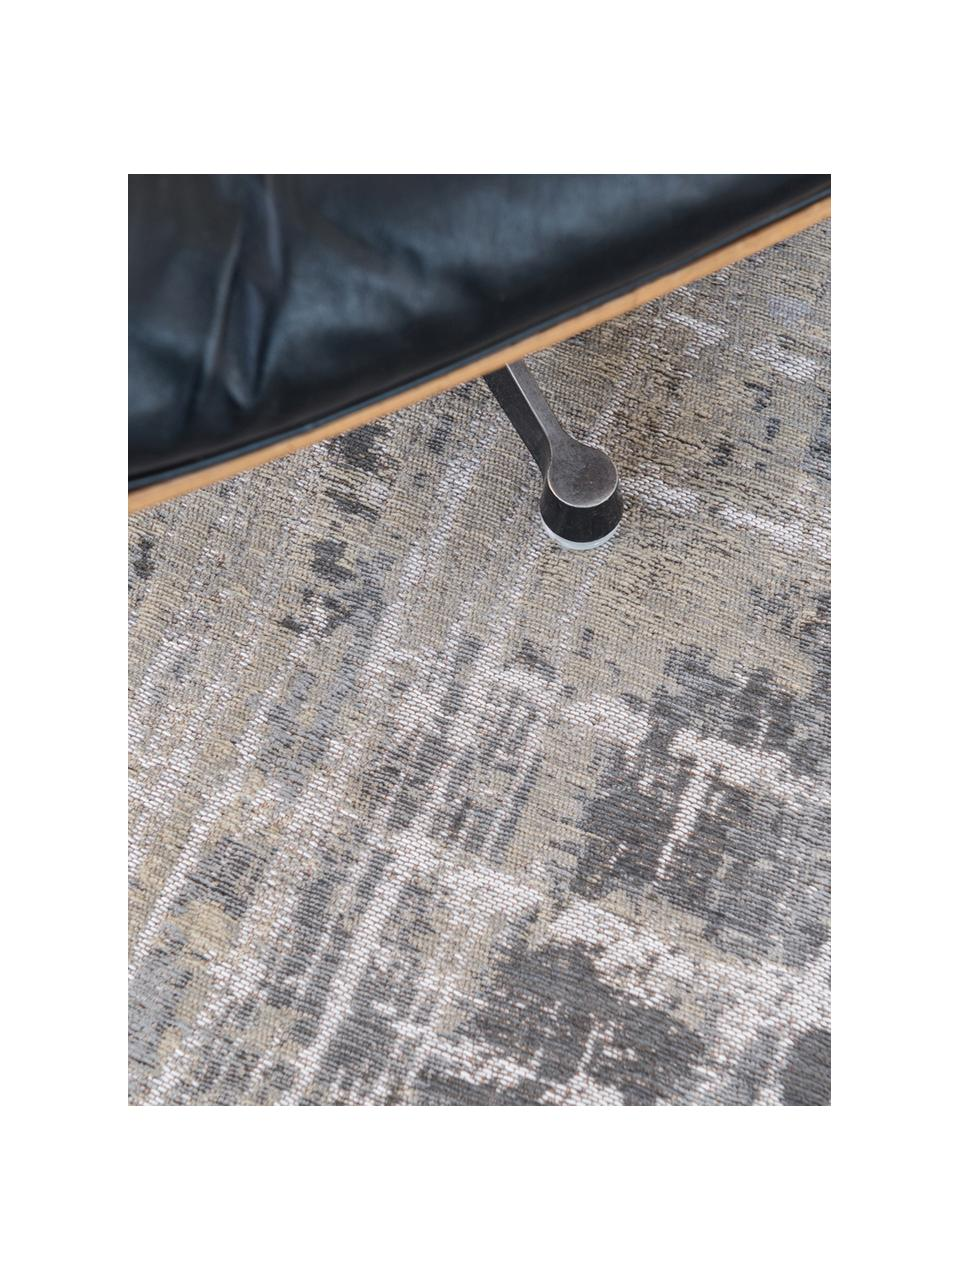 Tapis design vintage gris Streaks, Tonsgris